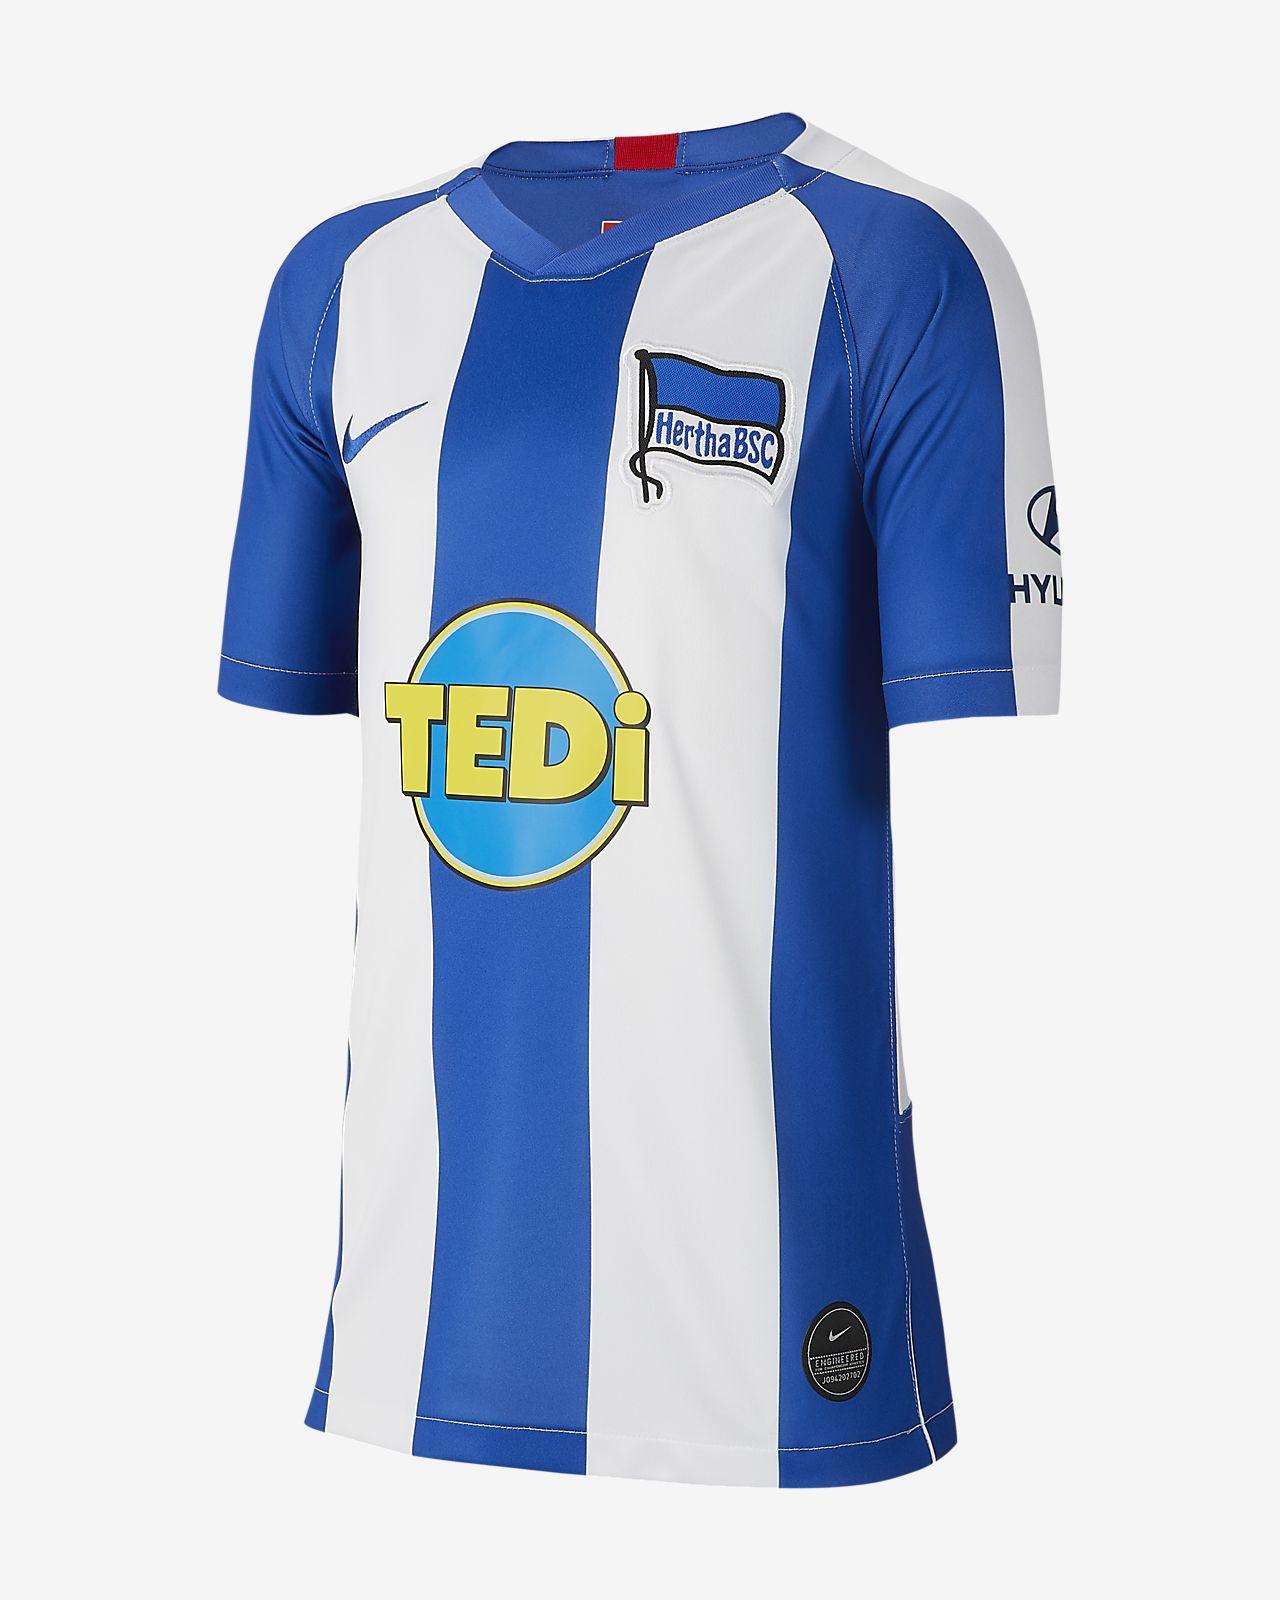 Hertha BSC 2019/20 Stadium Home Voetbalshirt voor kids